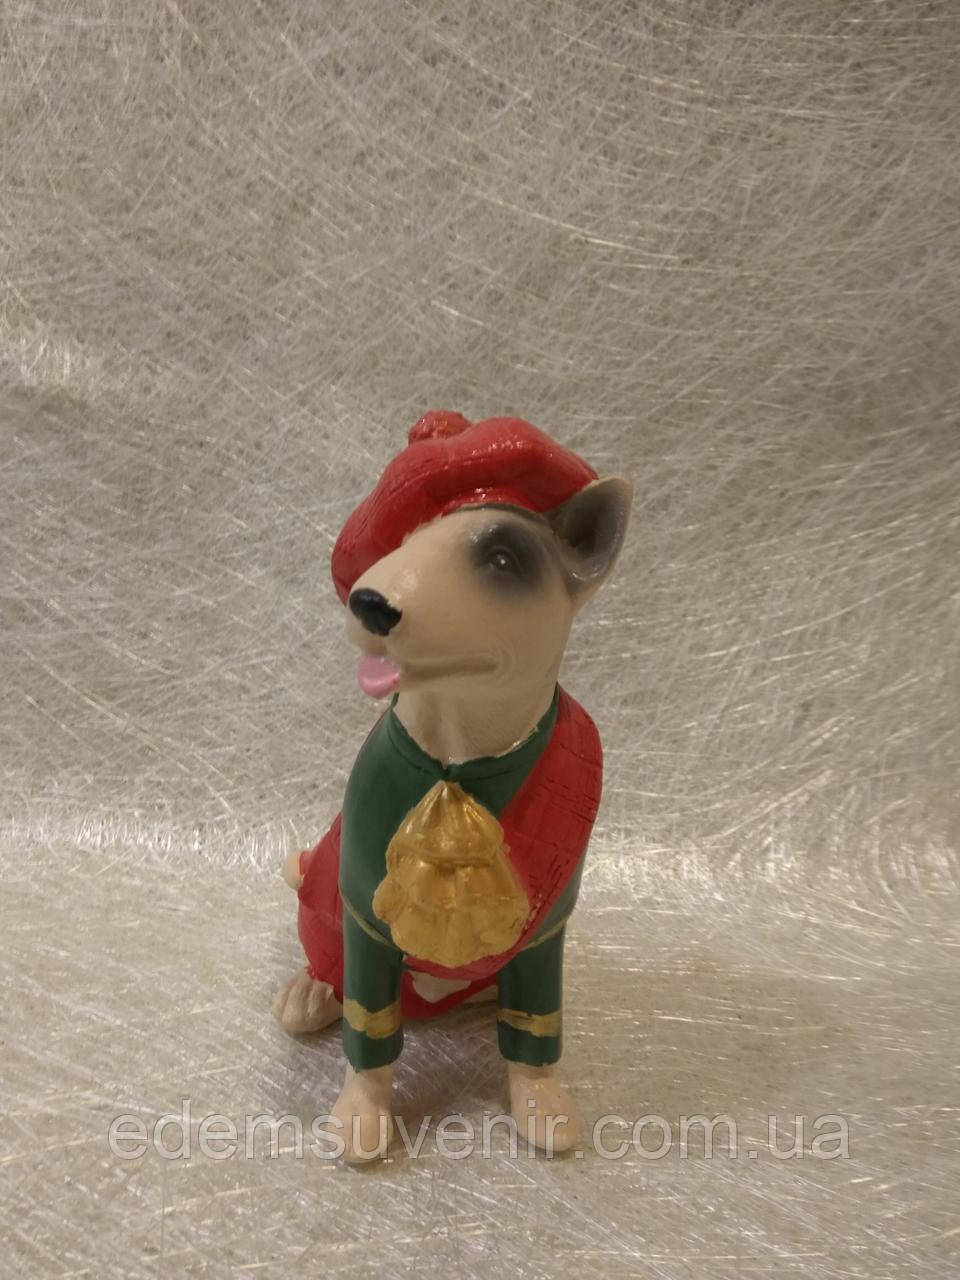 Статуэтка собака (собачка) бультерьер в шляпе